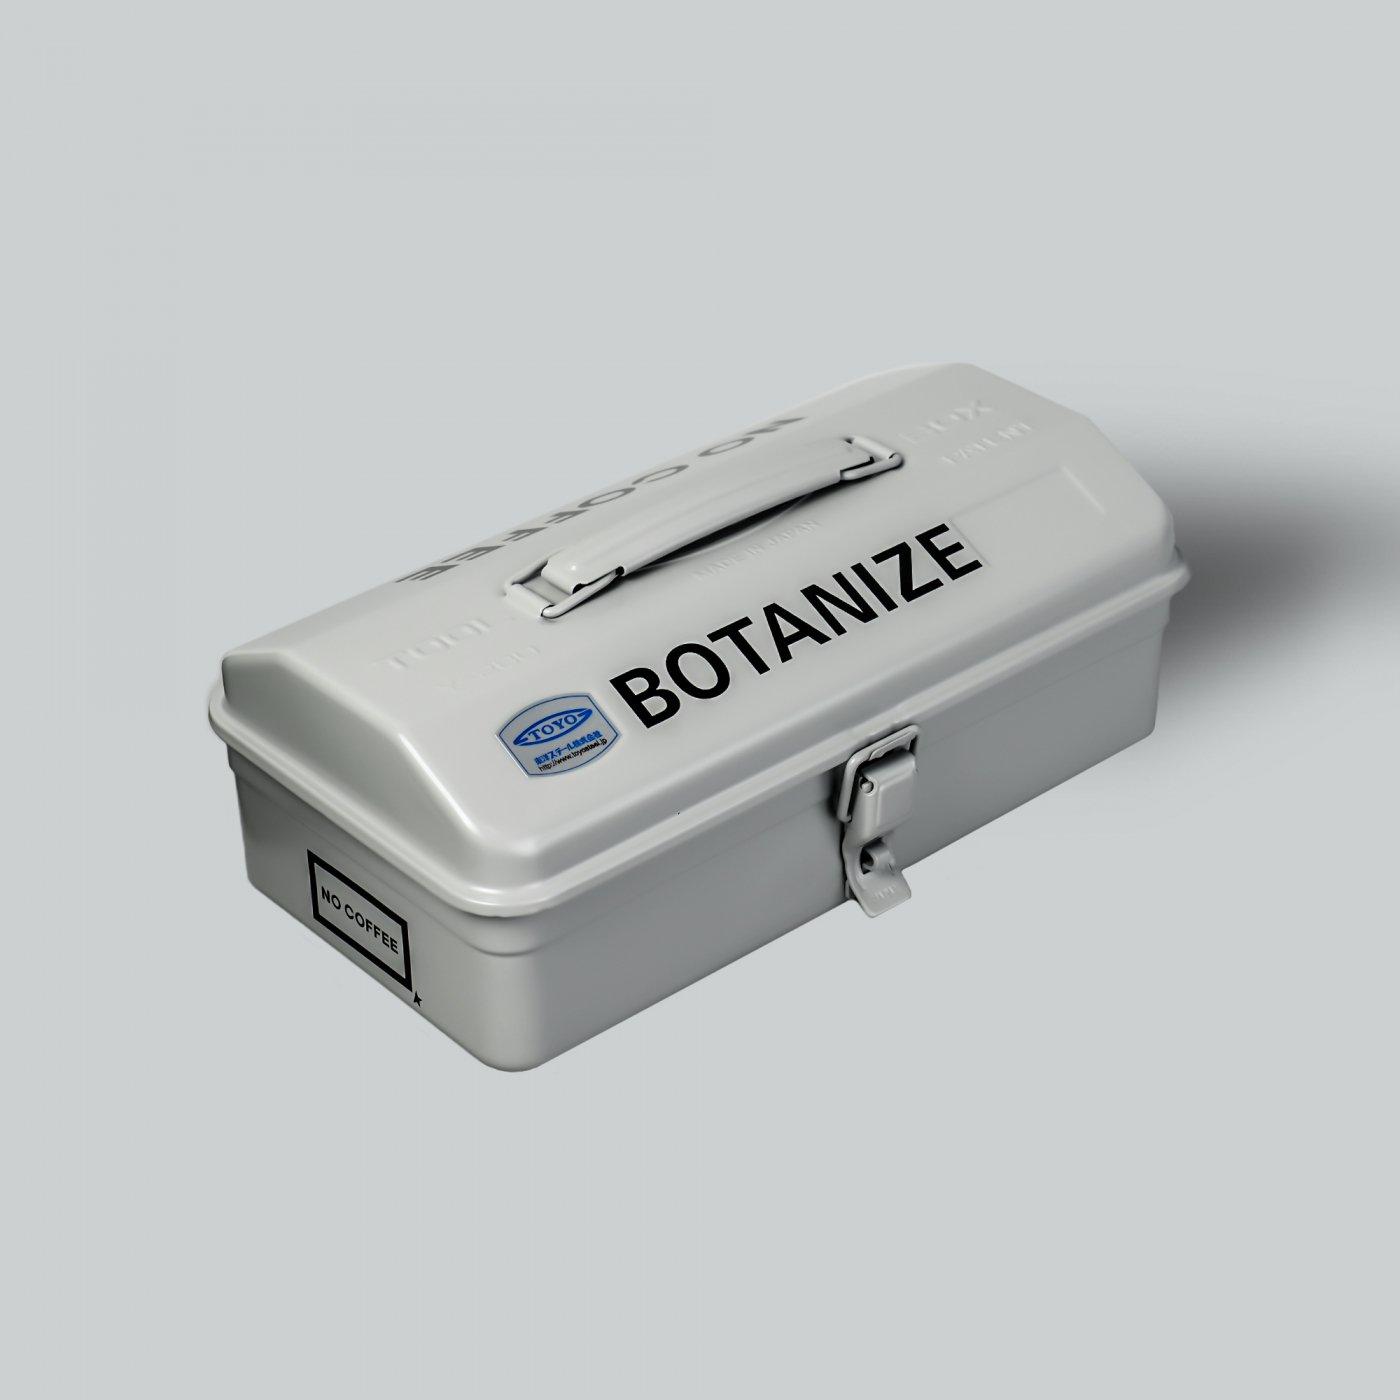 NO COFFEE × BOTANIZE × FIRSTORDER ツールボックス GRAY